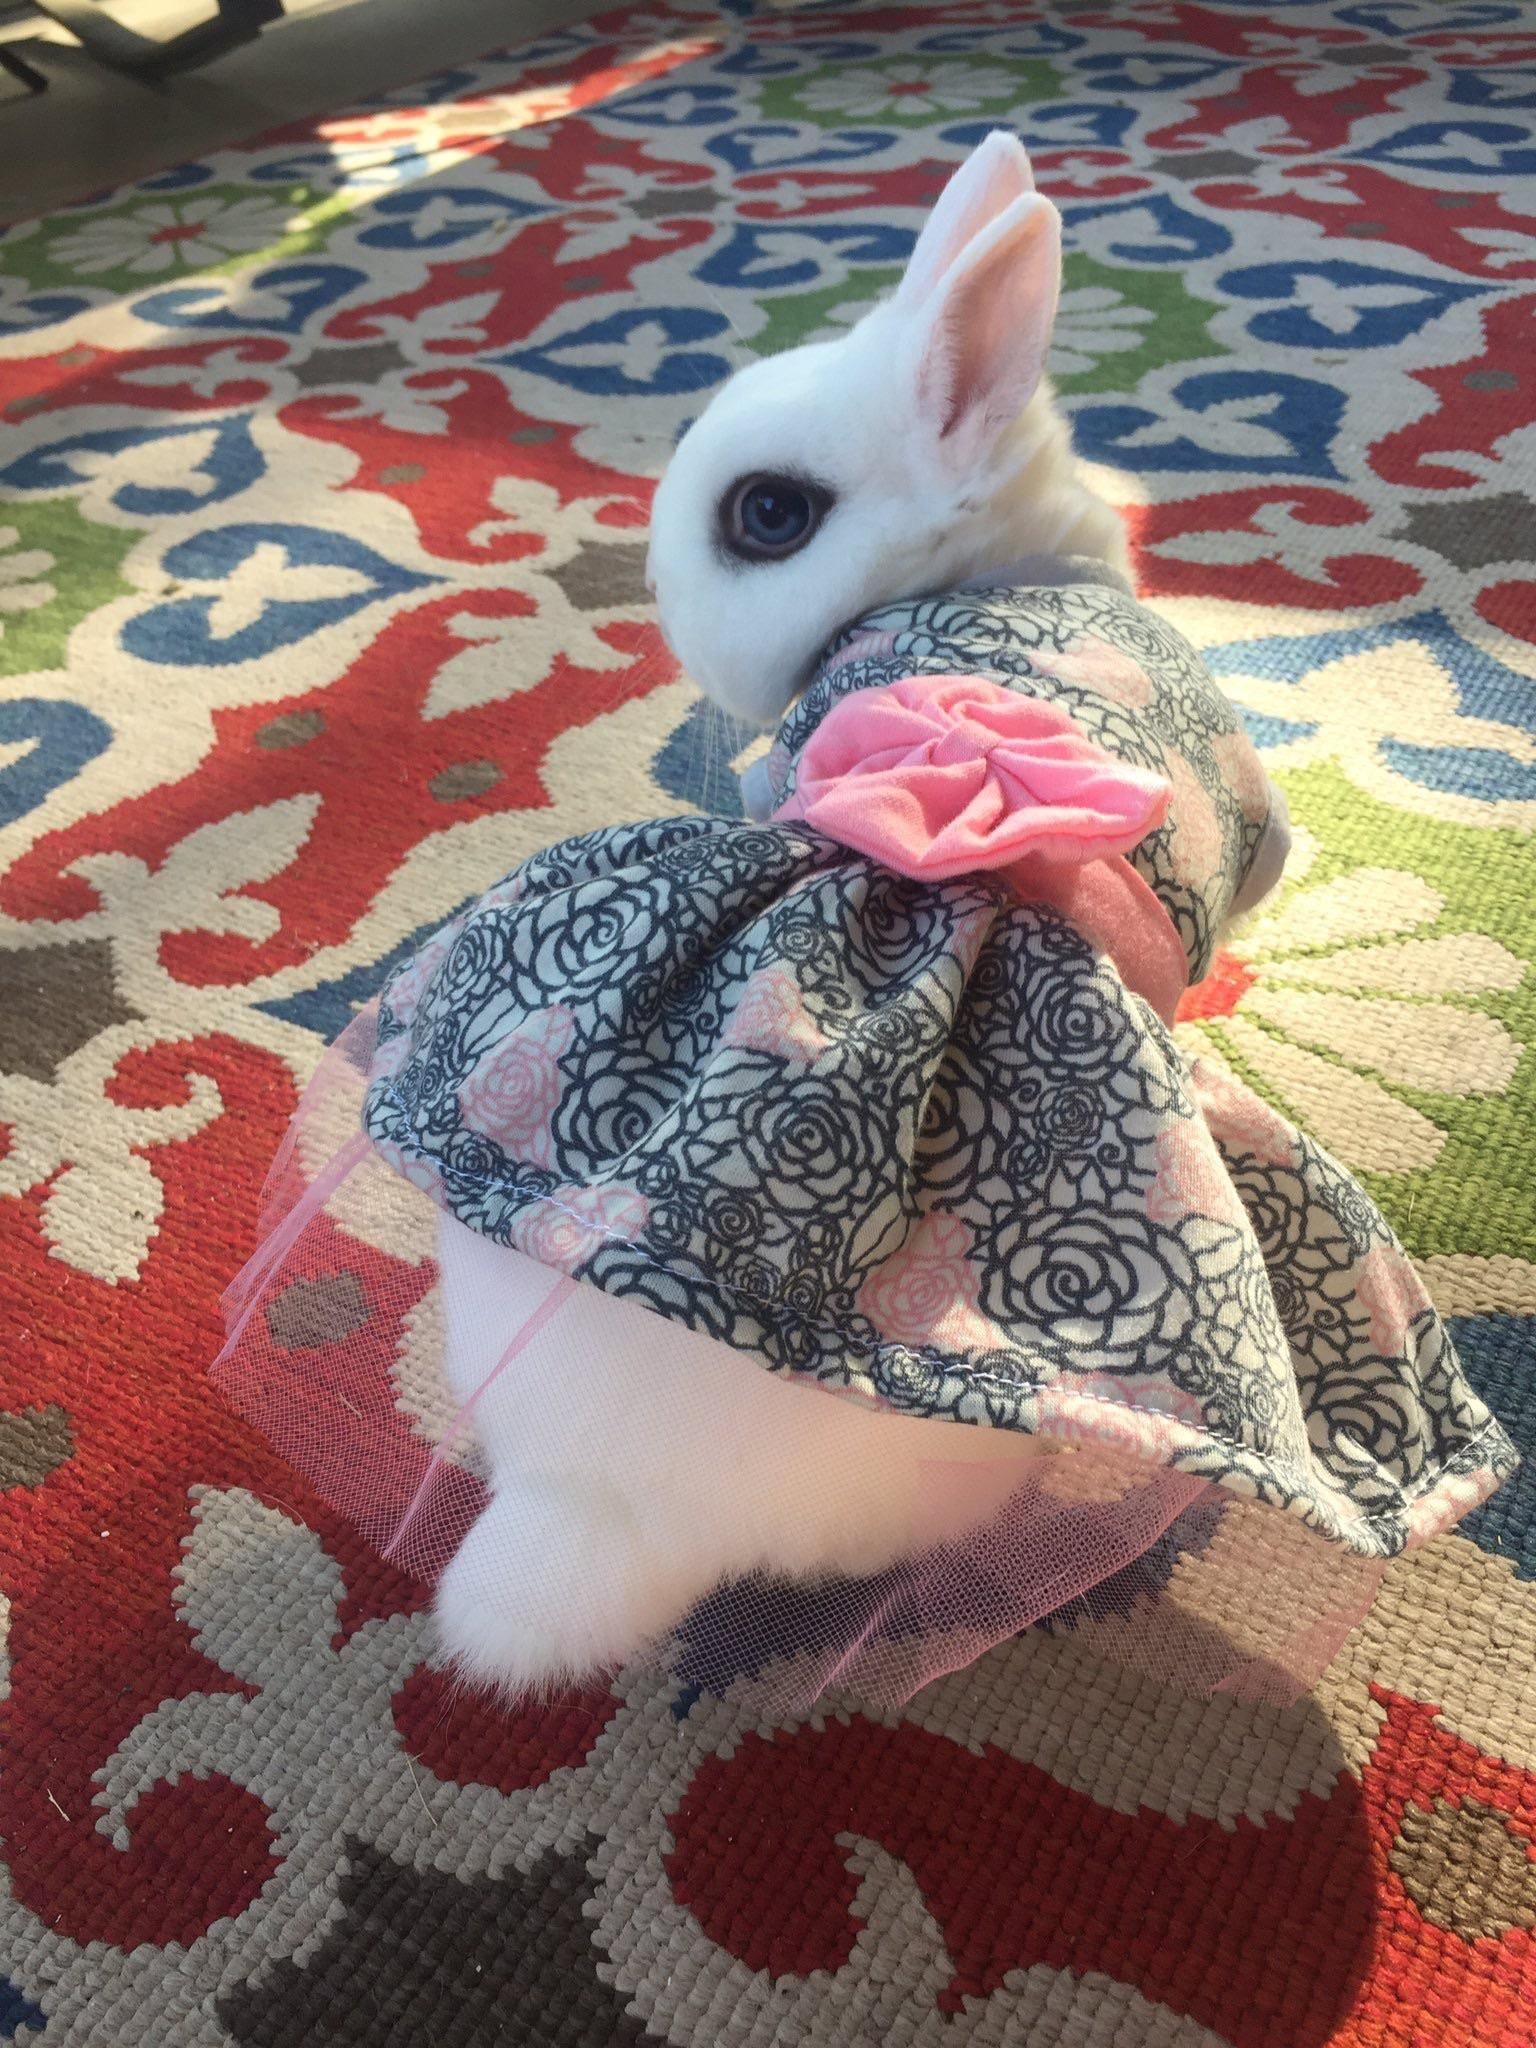 Pet Shop Near Me Rabbit Price